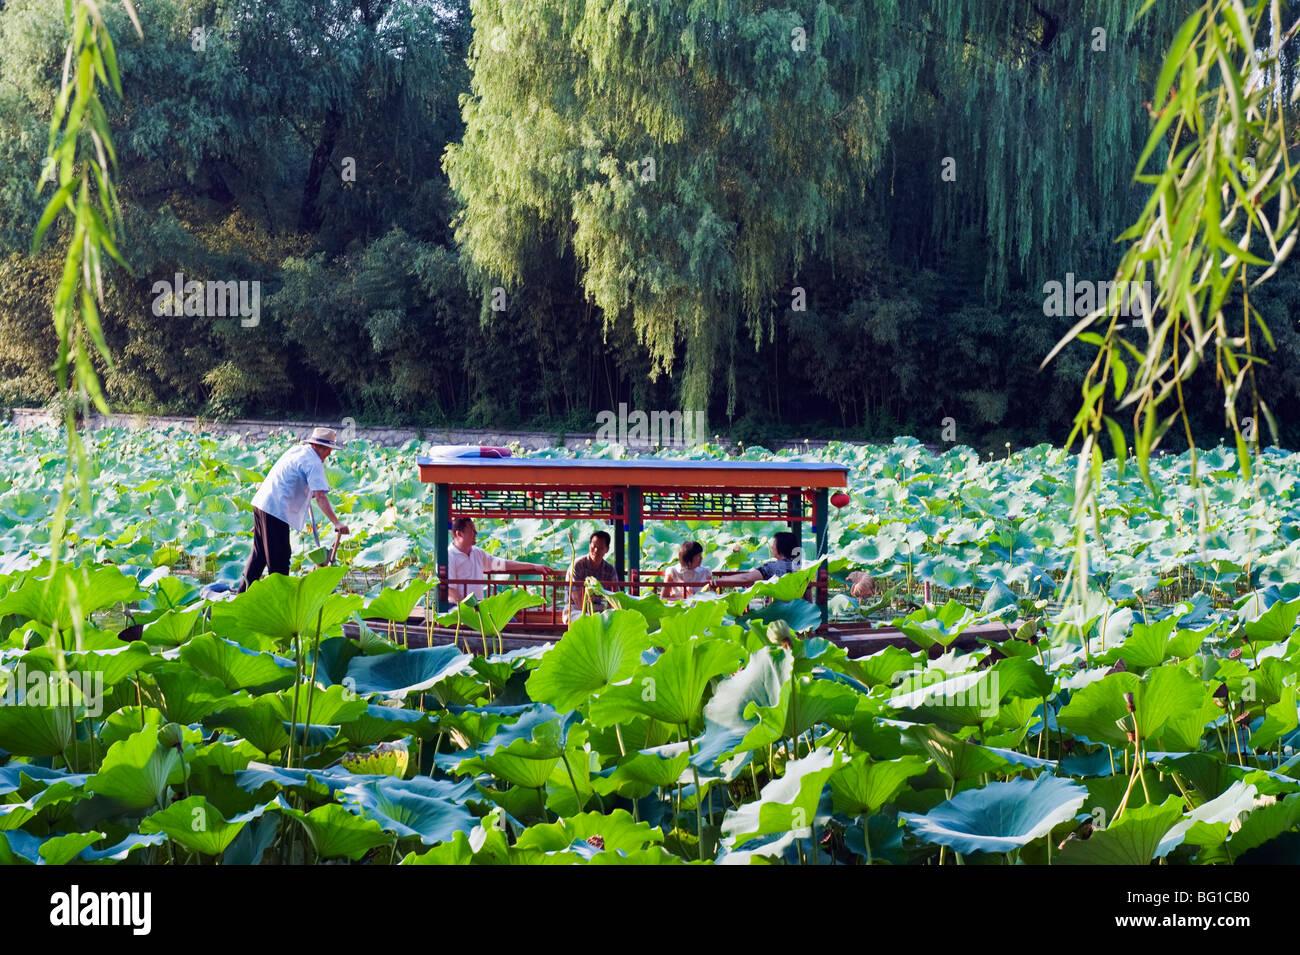 A boat punting through lily pads at Zizhuyuan Black Bamboo Park, Beijing, China, Asia - Stock Image